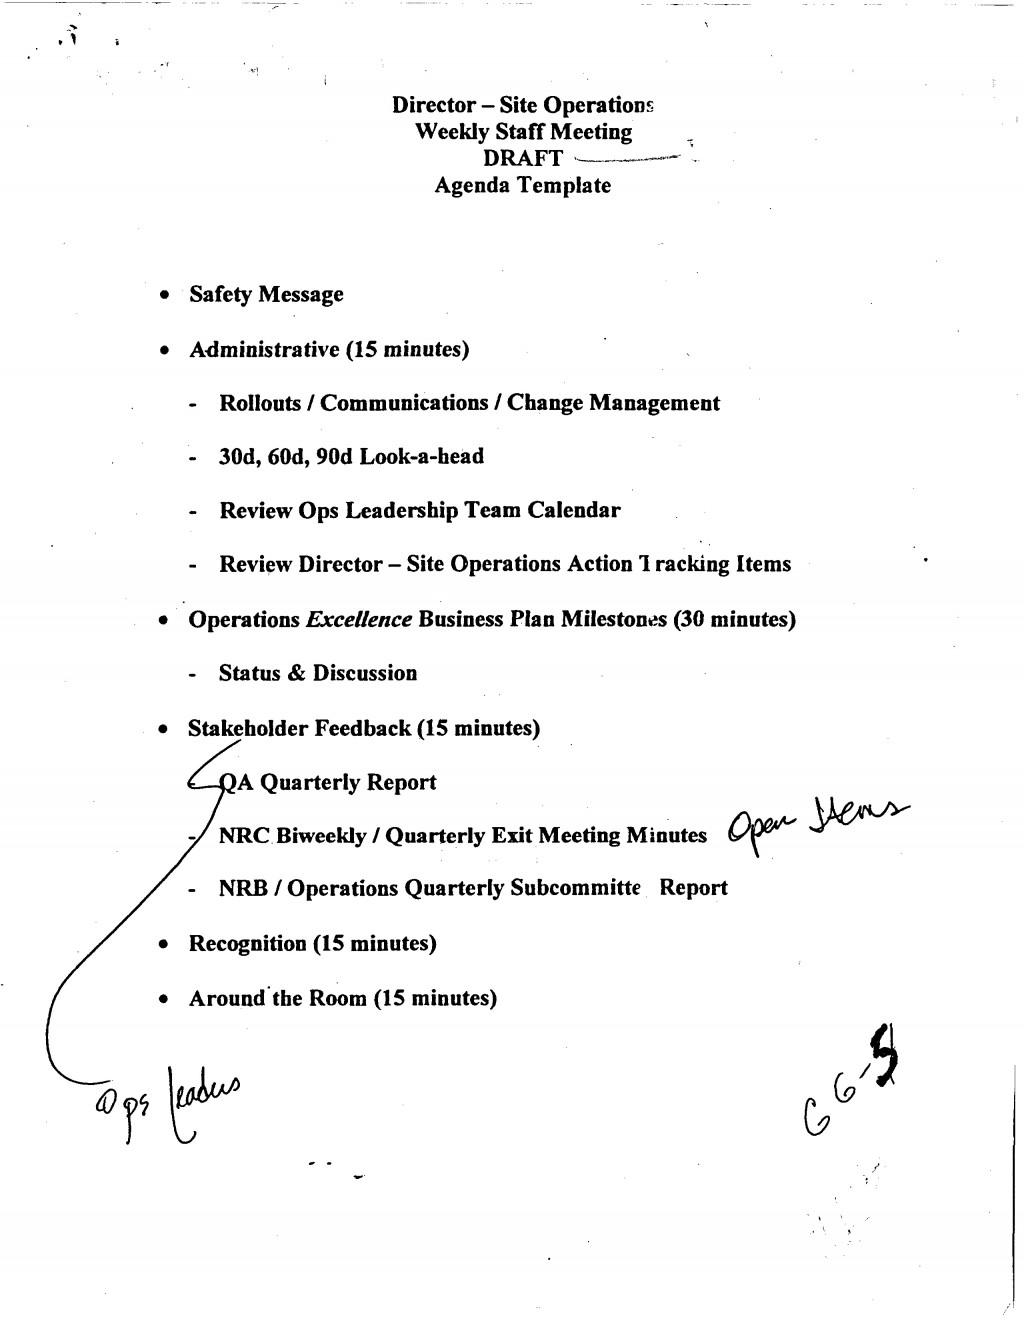 004 Dreaded Staff Meeting Agenda Template Design  Example Pdf Sample FormatLarge